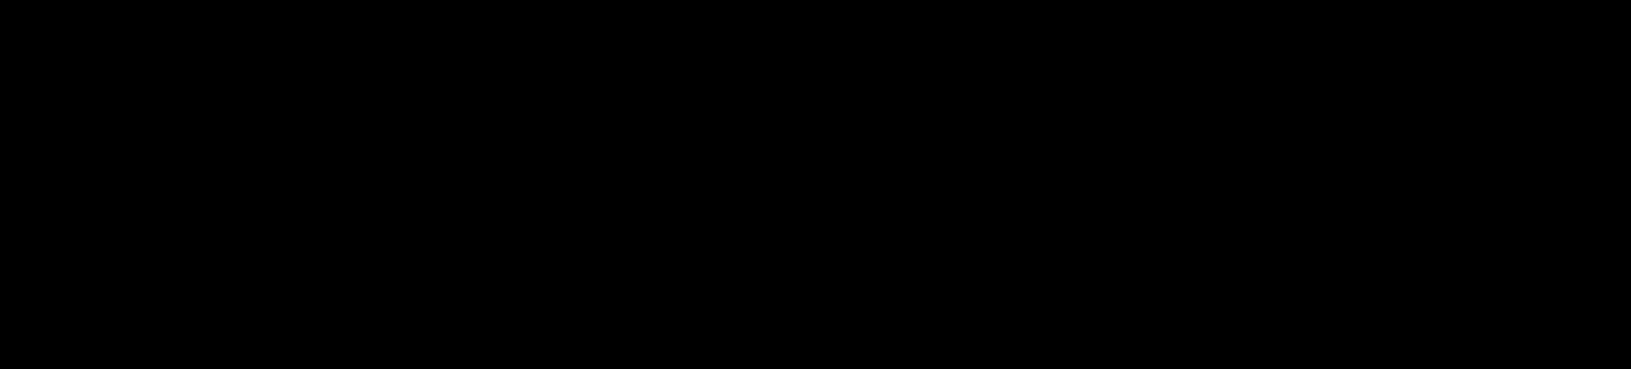 SPIDER CABINETS